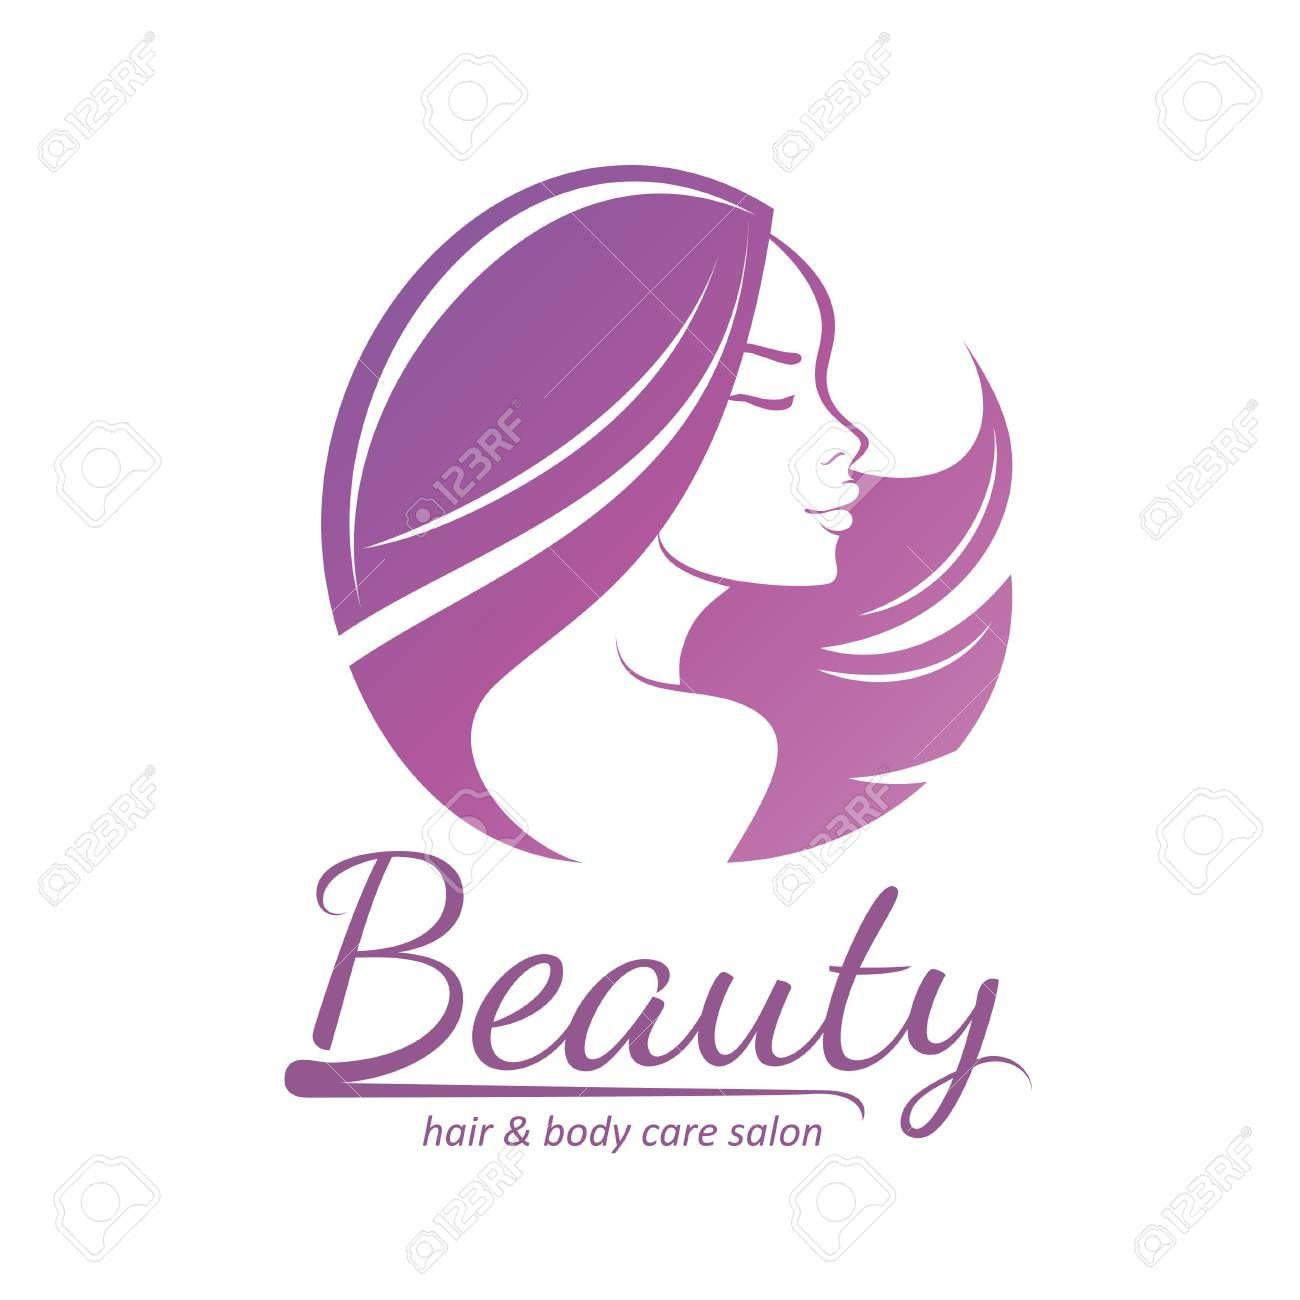 Womans Hair Style Stylized Sillhouette Beauty Salon Logo Template Ad Style Stylized Womans Hair Si Beauty Salon Logo Womens Hairstyles Salon Logo